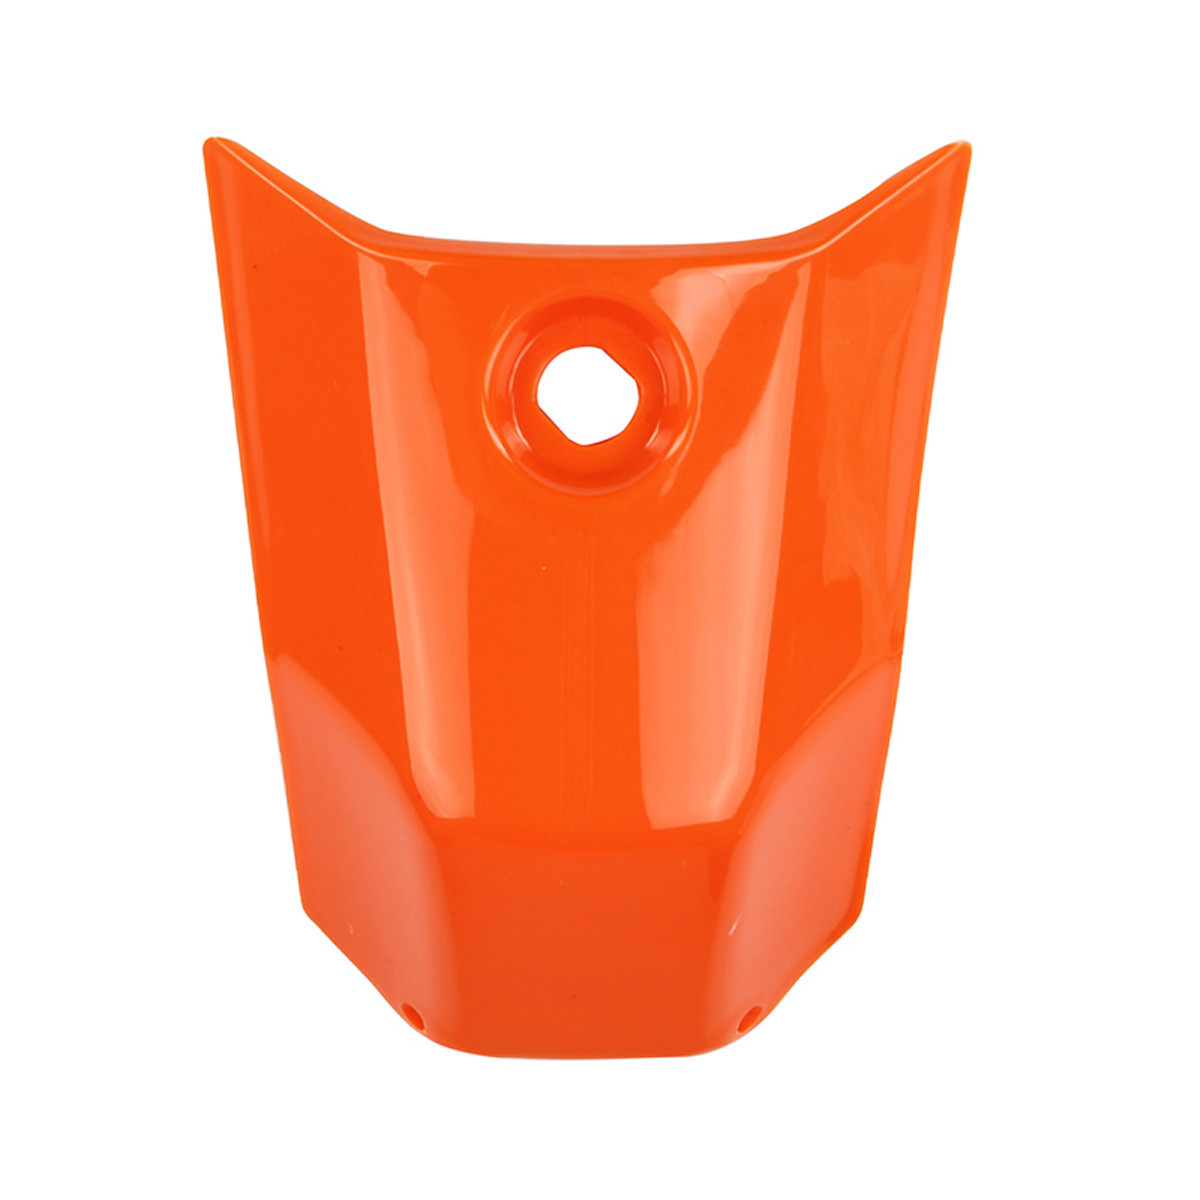 Trappe réservoir essence DERBI Senda Extreme Xrace - Orange